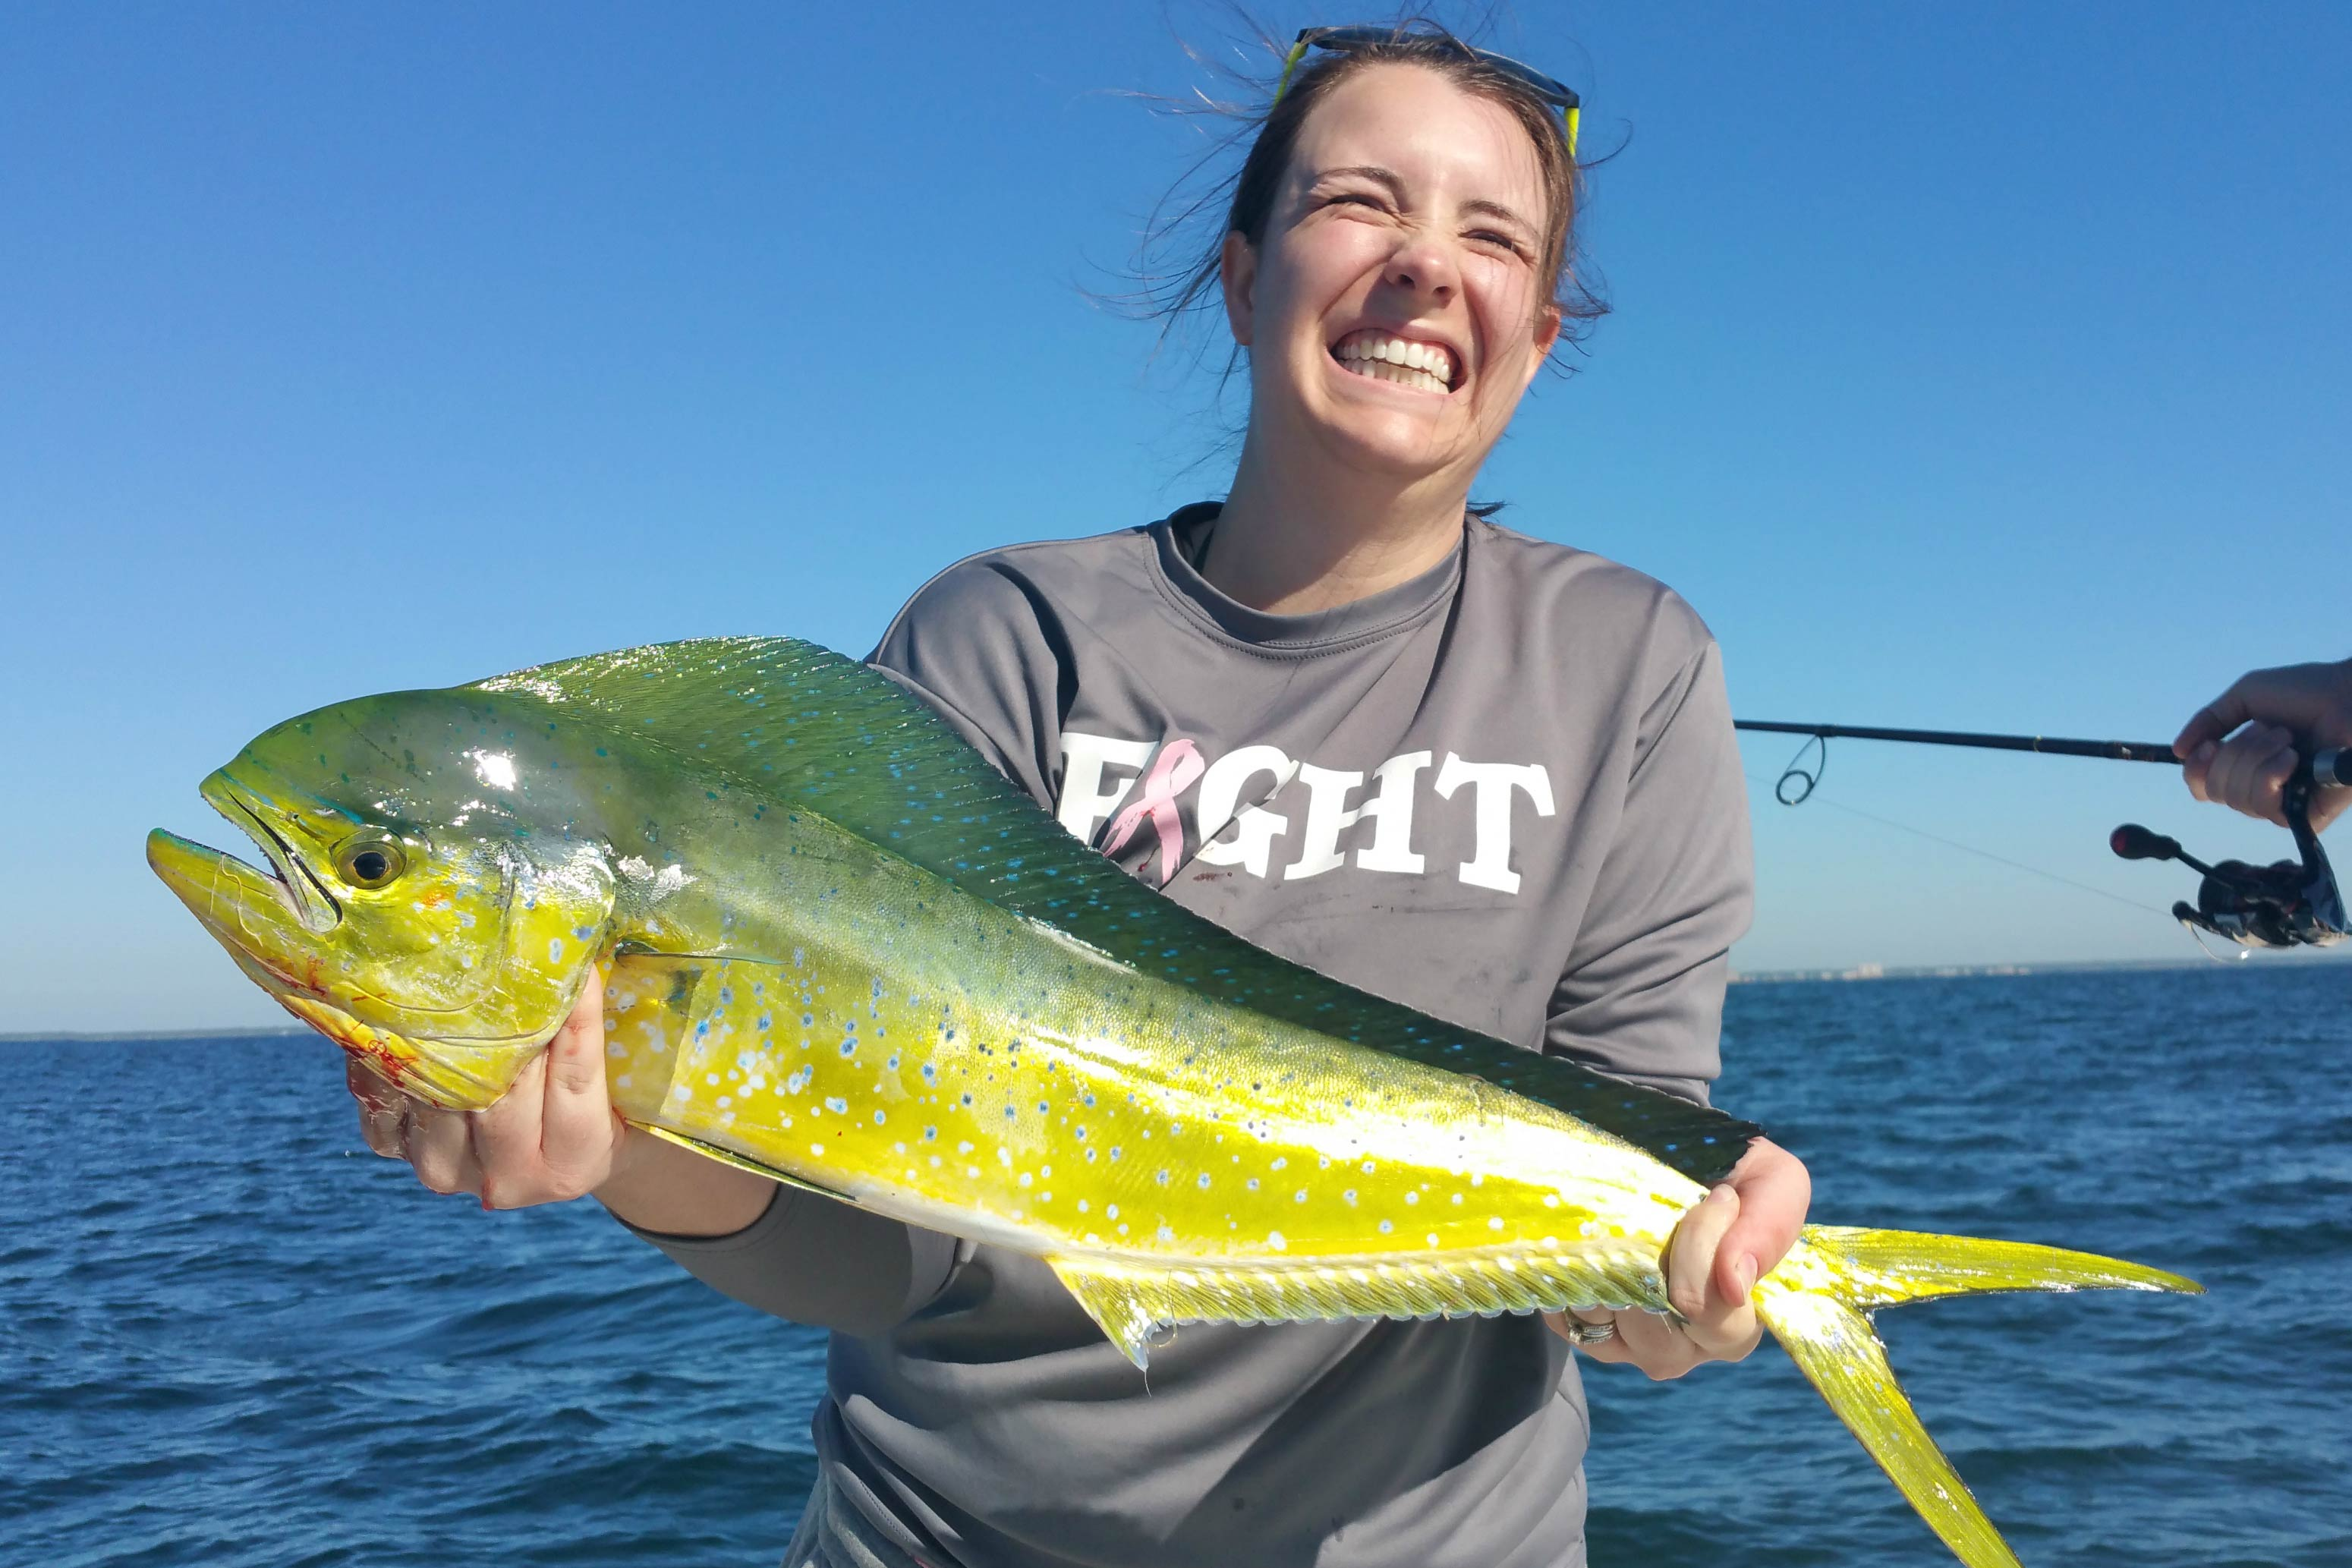 A woman smiles as she holds a Mahi Mahi caught in Florida